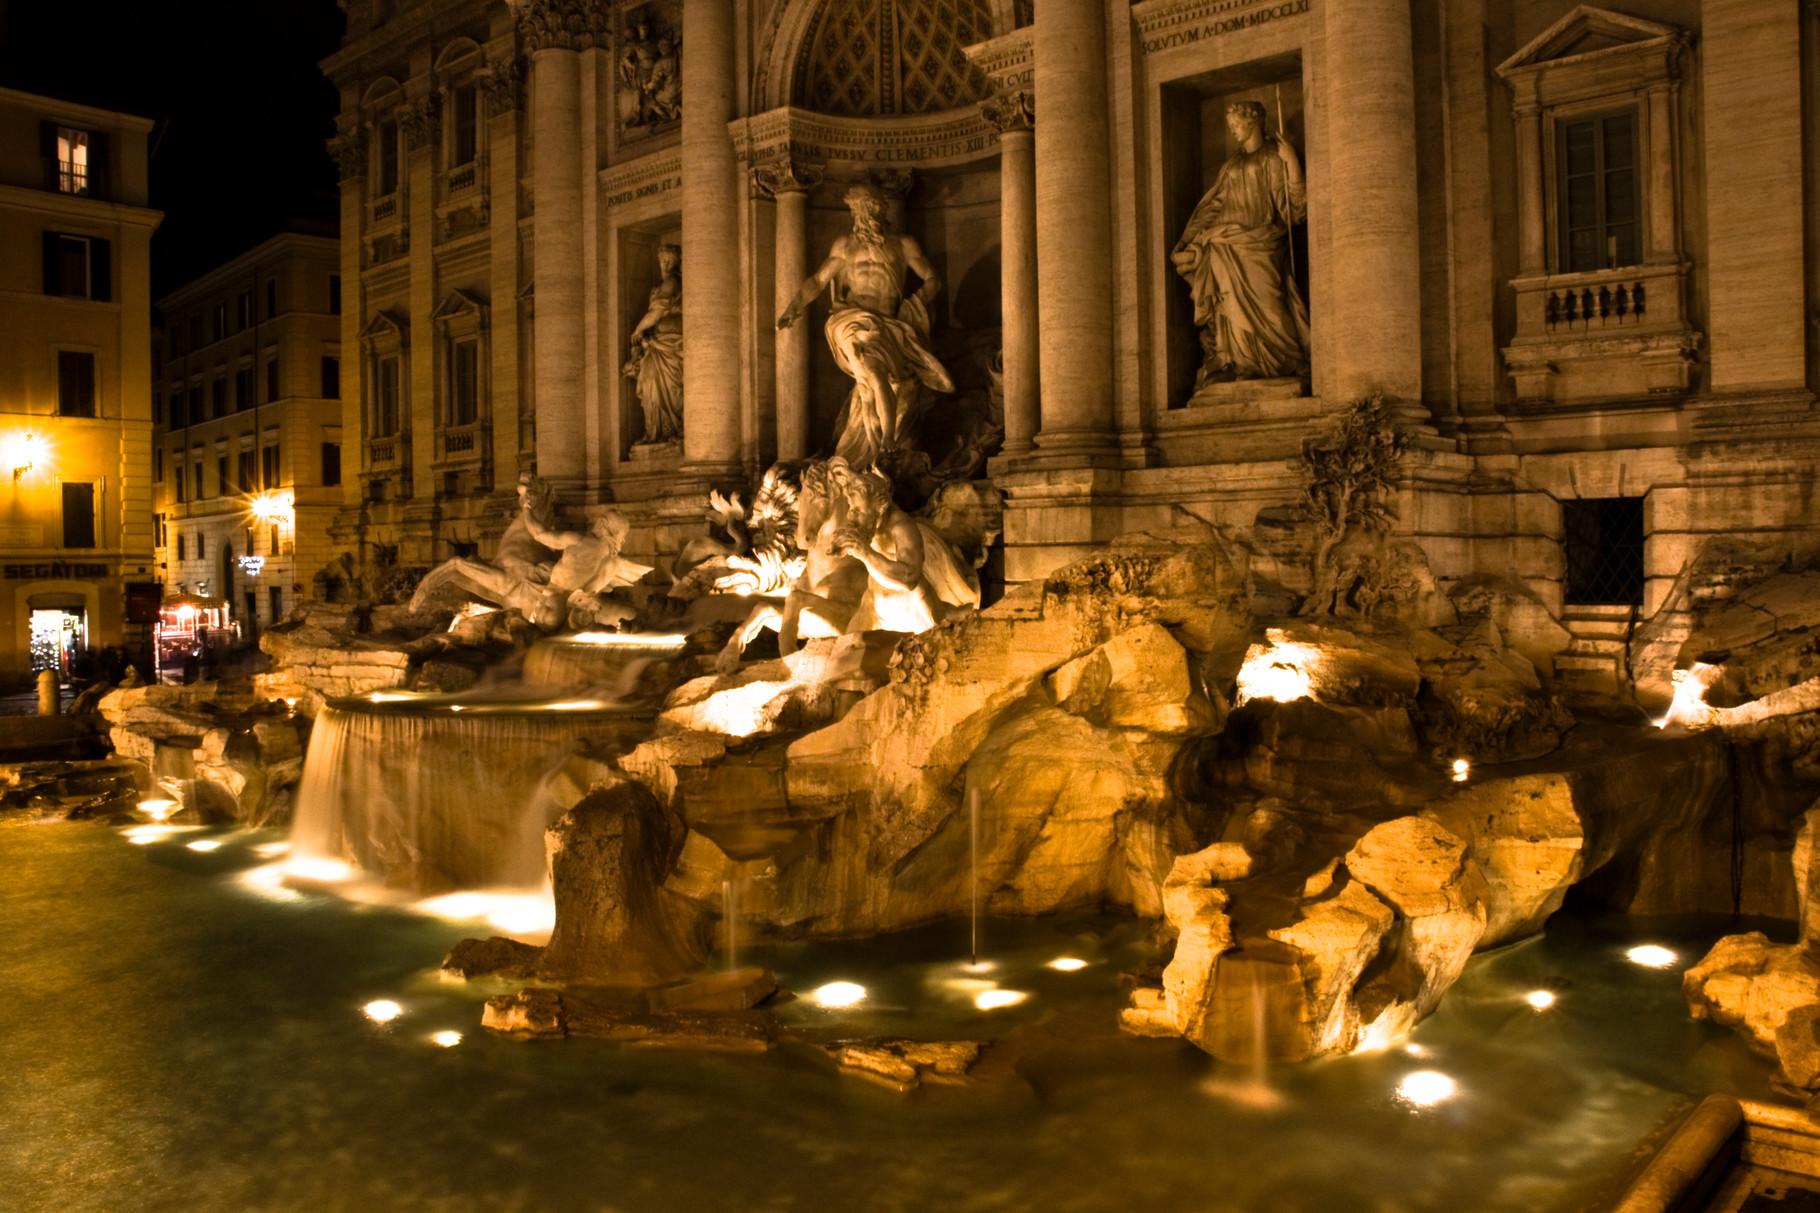 24_Rom - Trevi Brunnen bei Nacht.